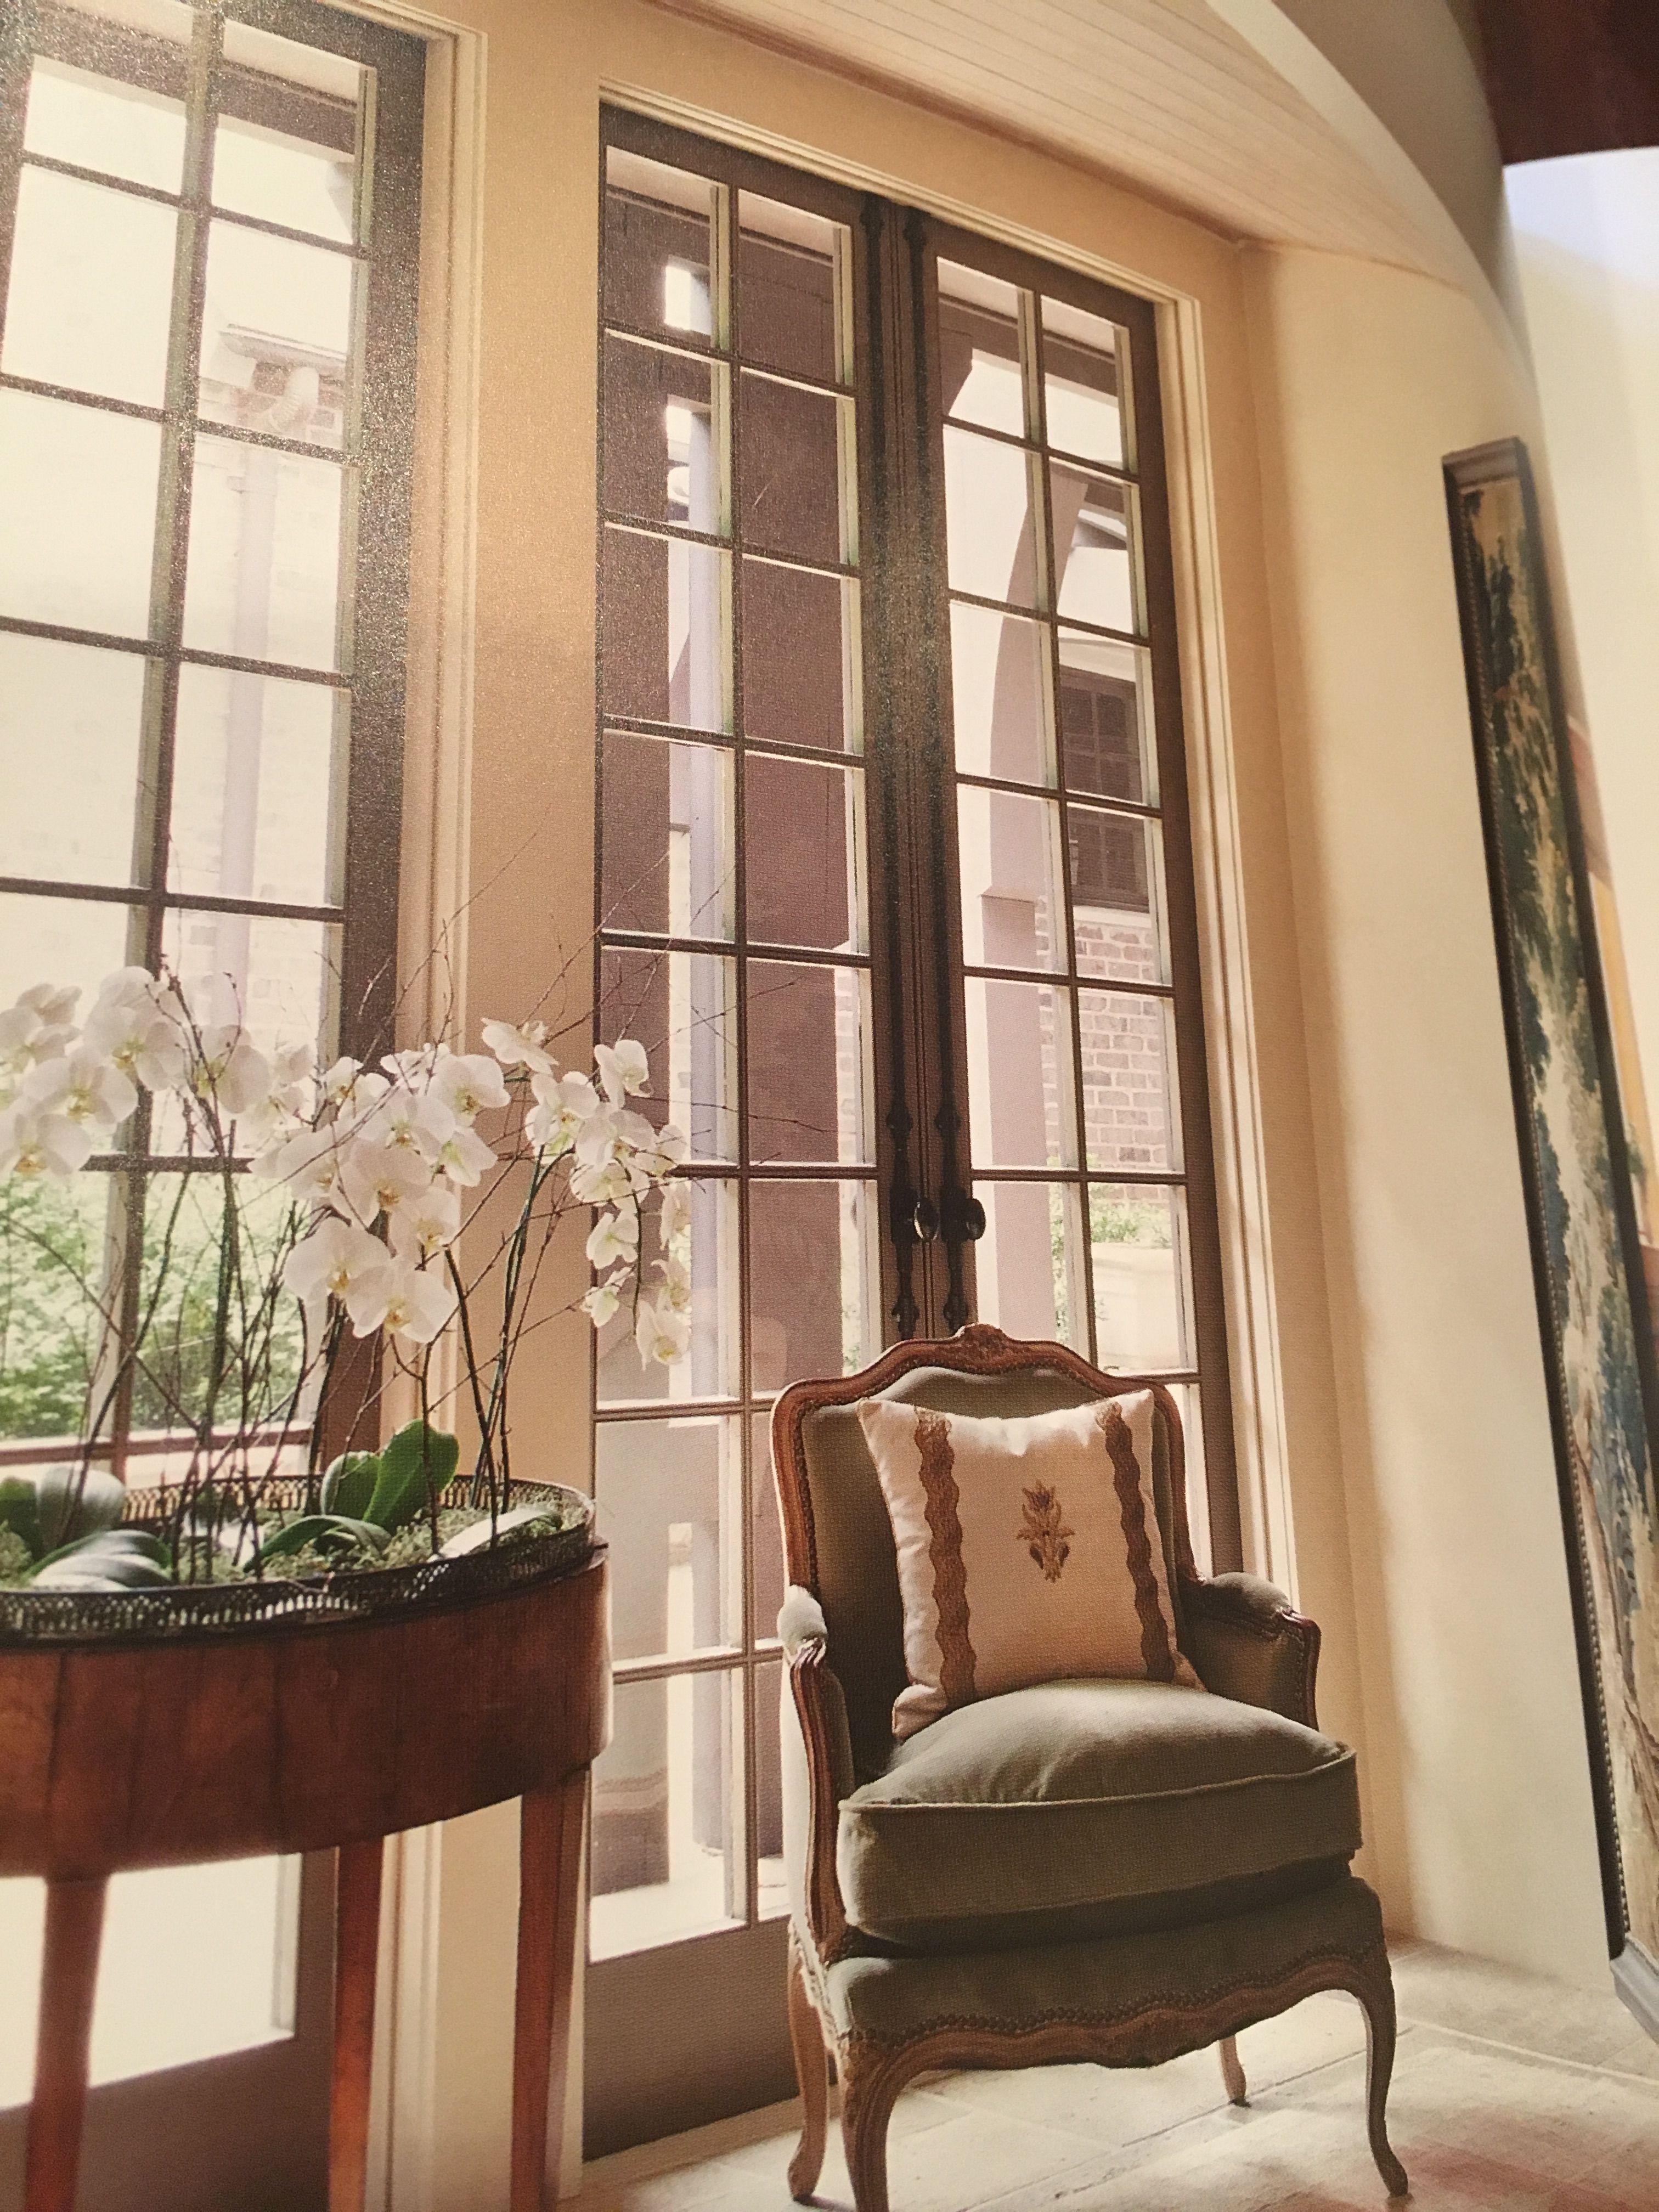 Window casing ideas  littleno trim dark windows  house  pinterest  window and house